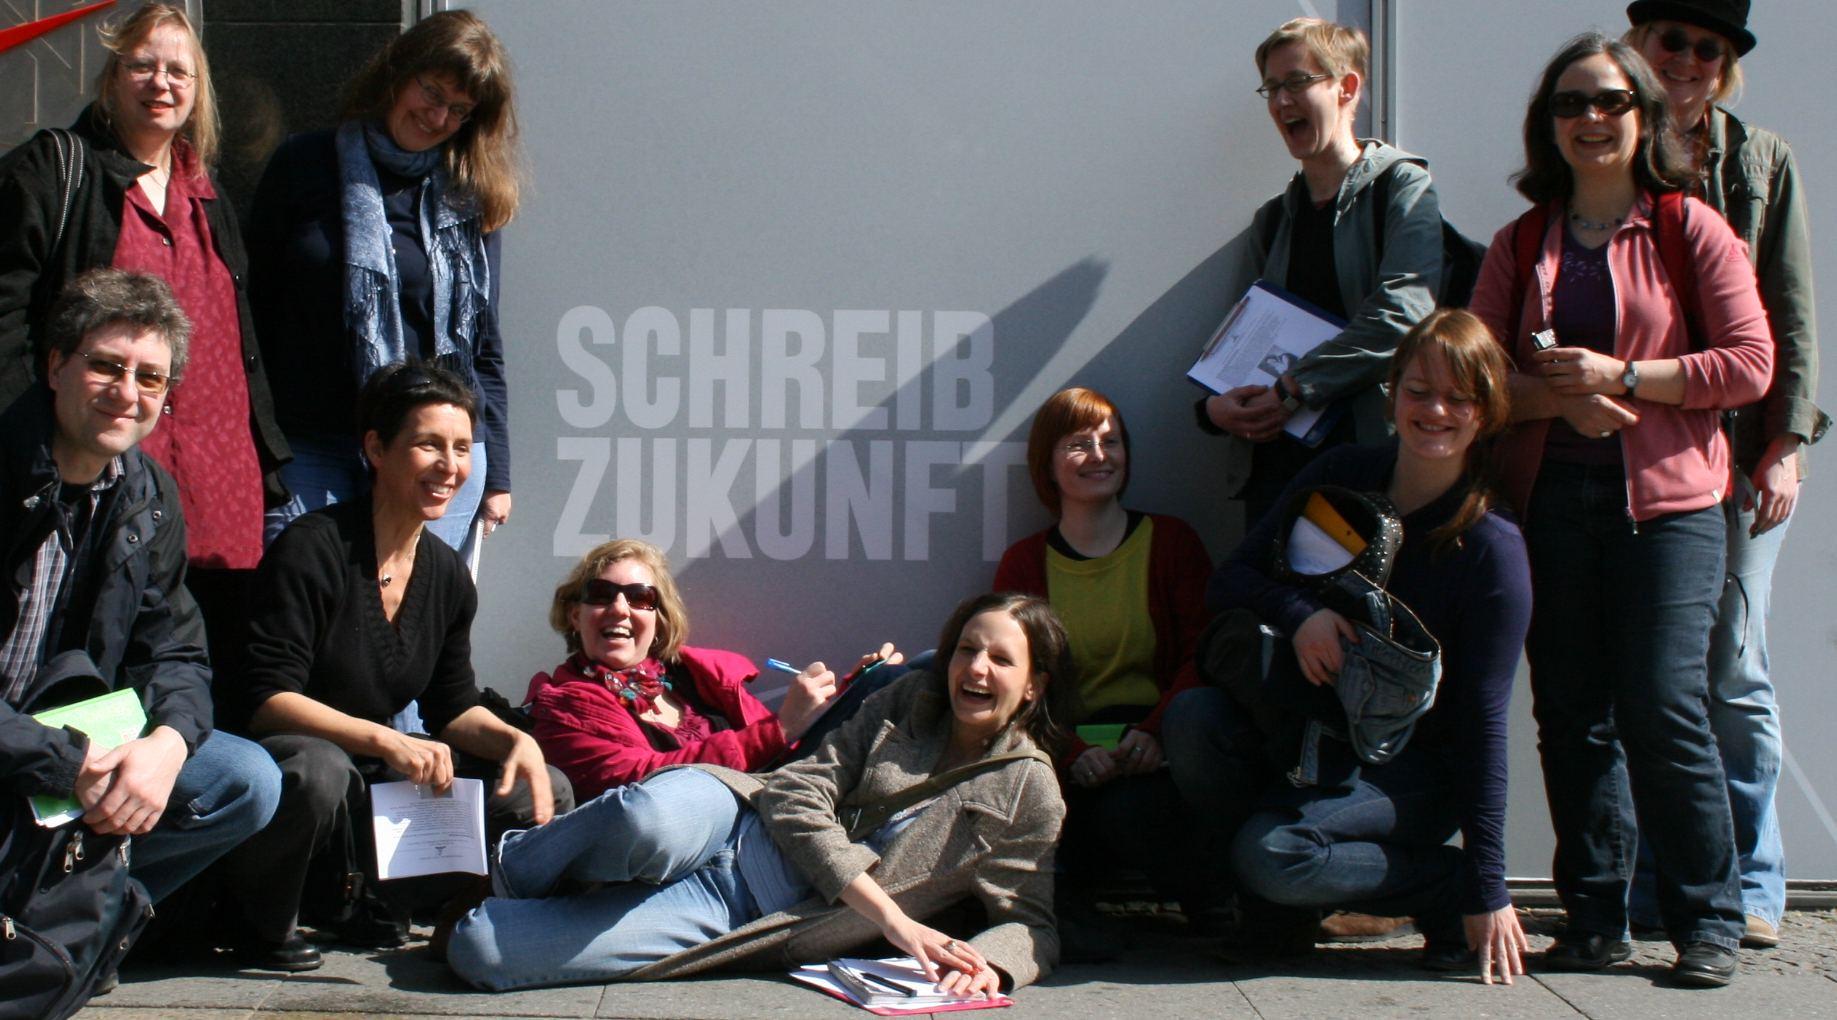 Arbeitskreis Schreibdidaktik Treffen 2010 in Berlin